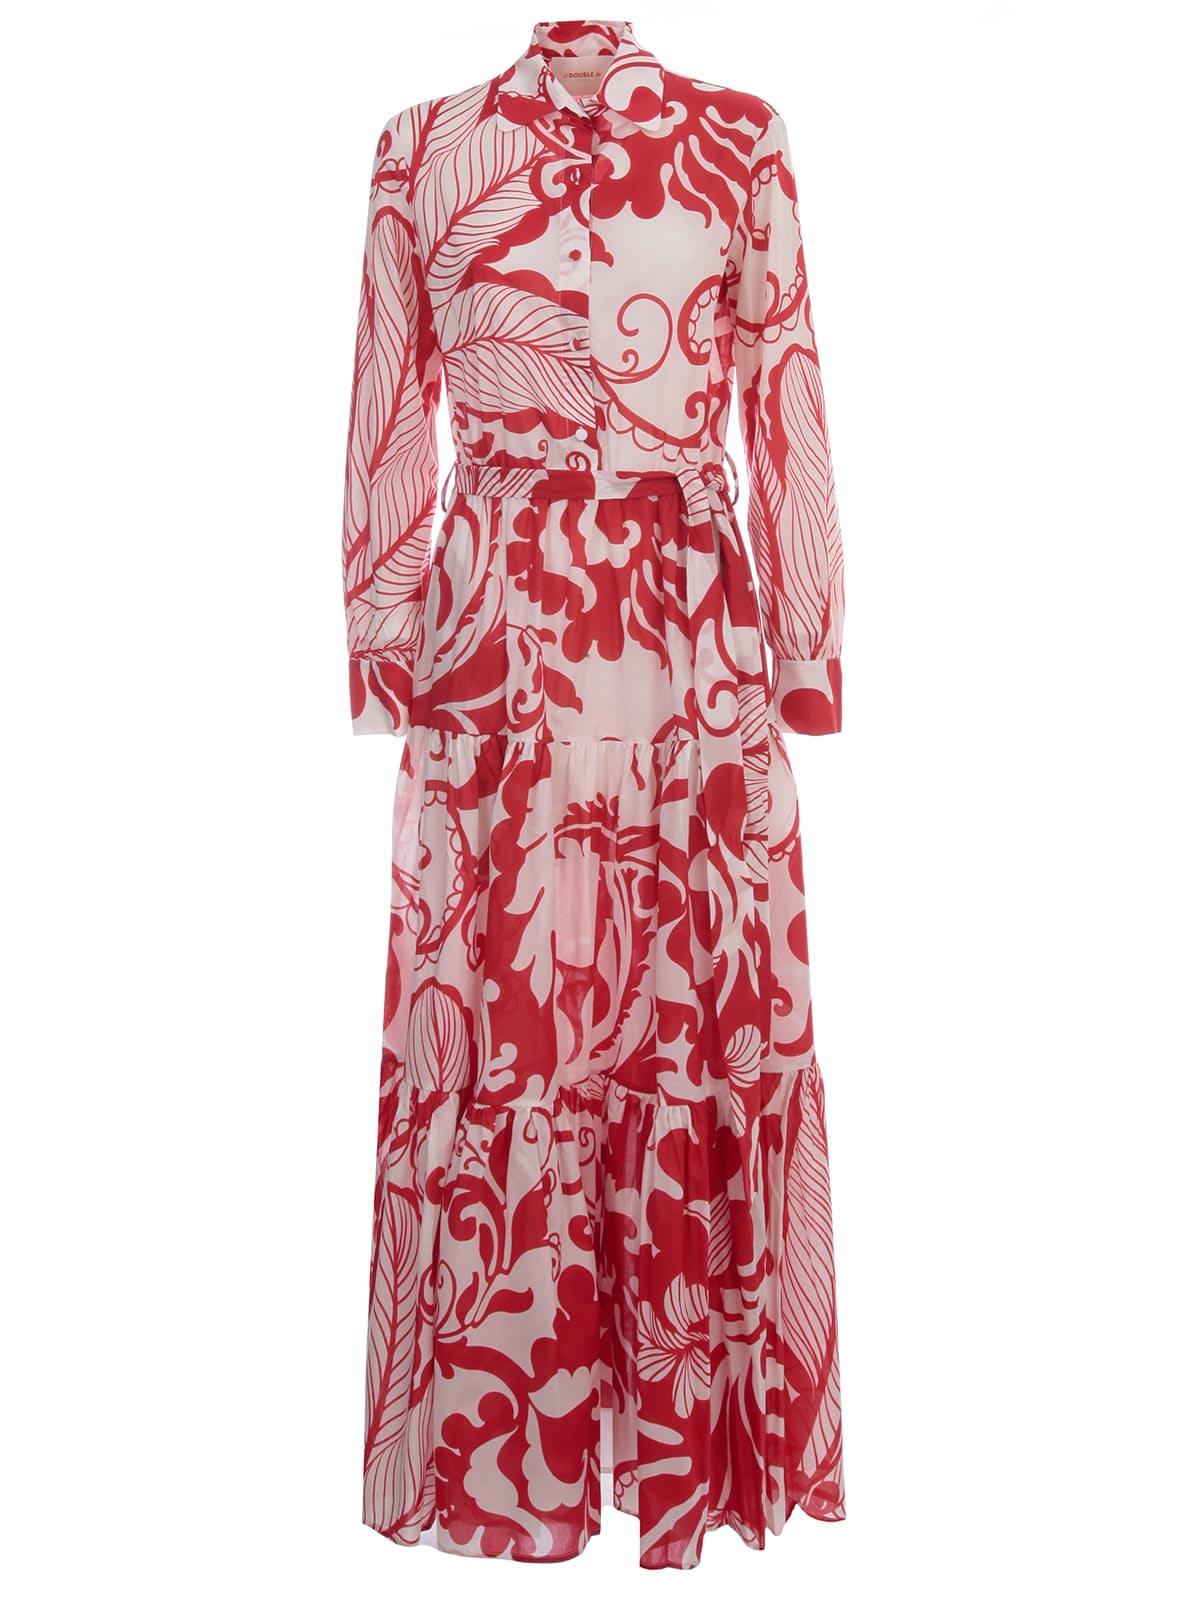 Buy La DoubleJ Bellini Fantasy Dress Cotton Voille online, shop La DoubleJ with free shipping